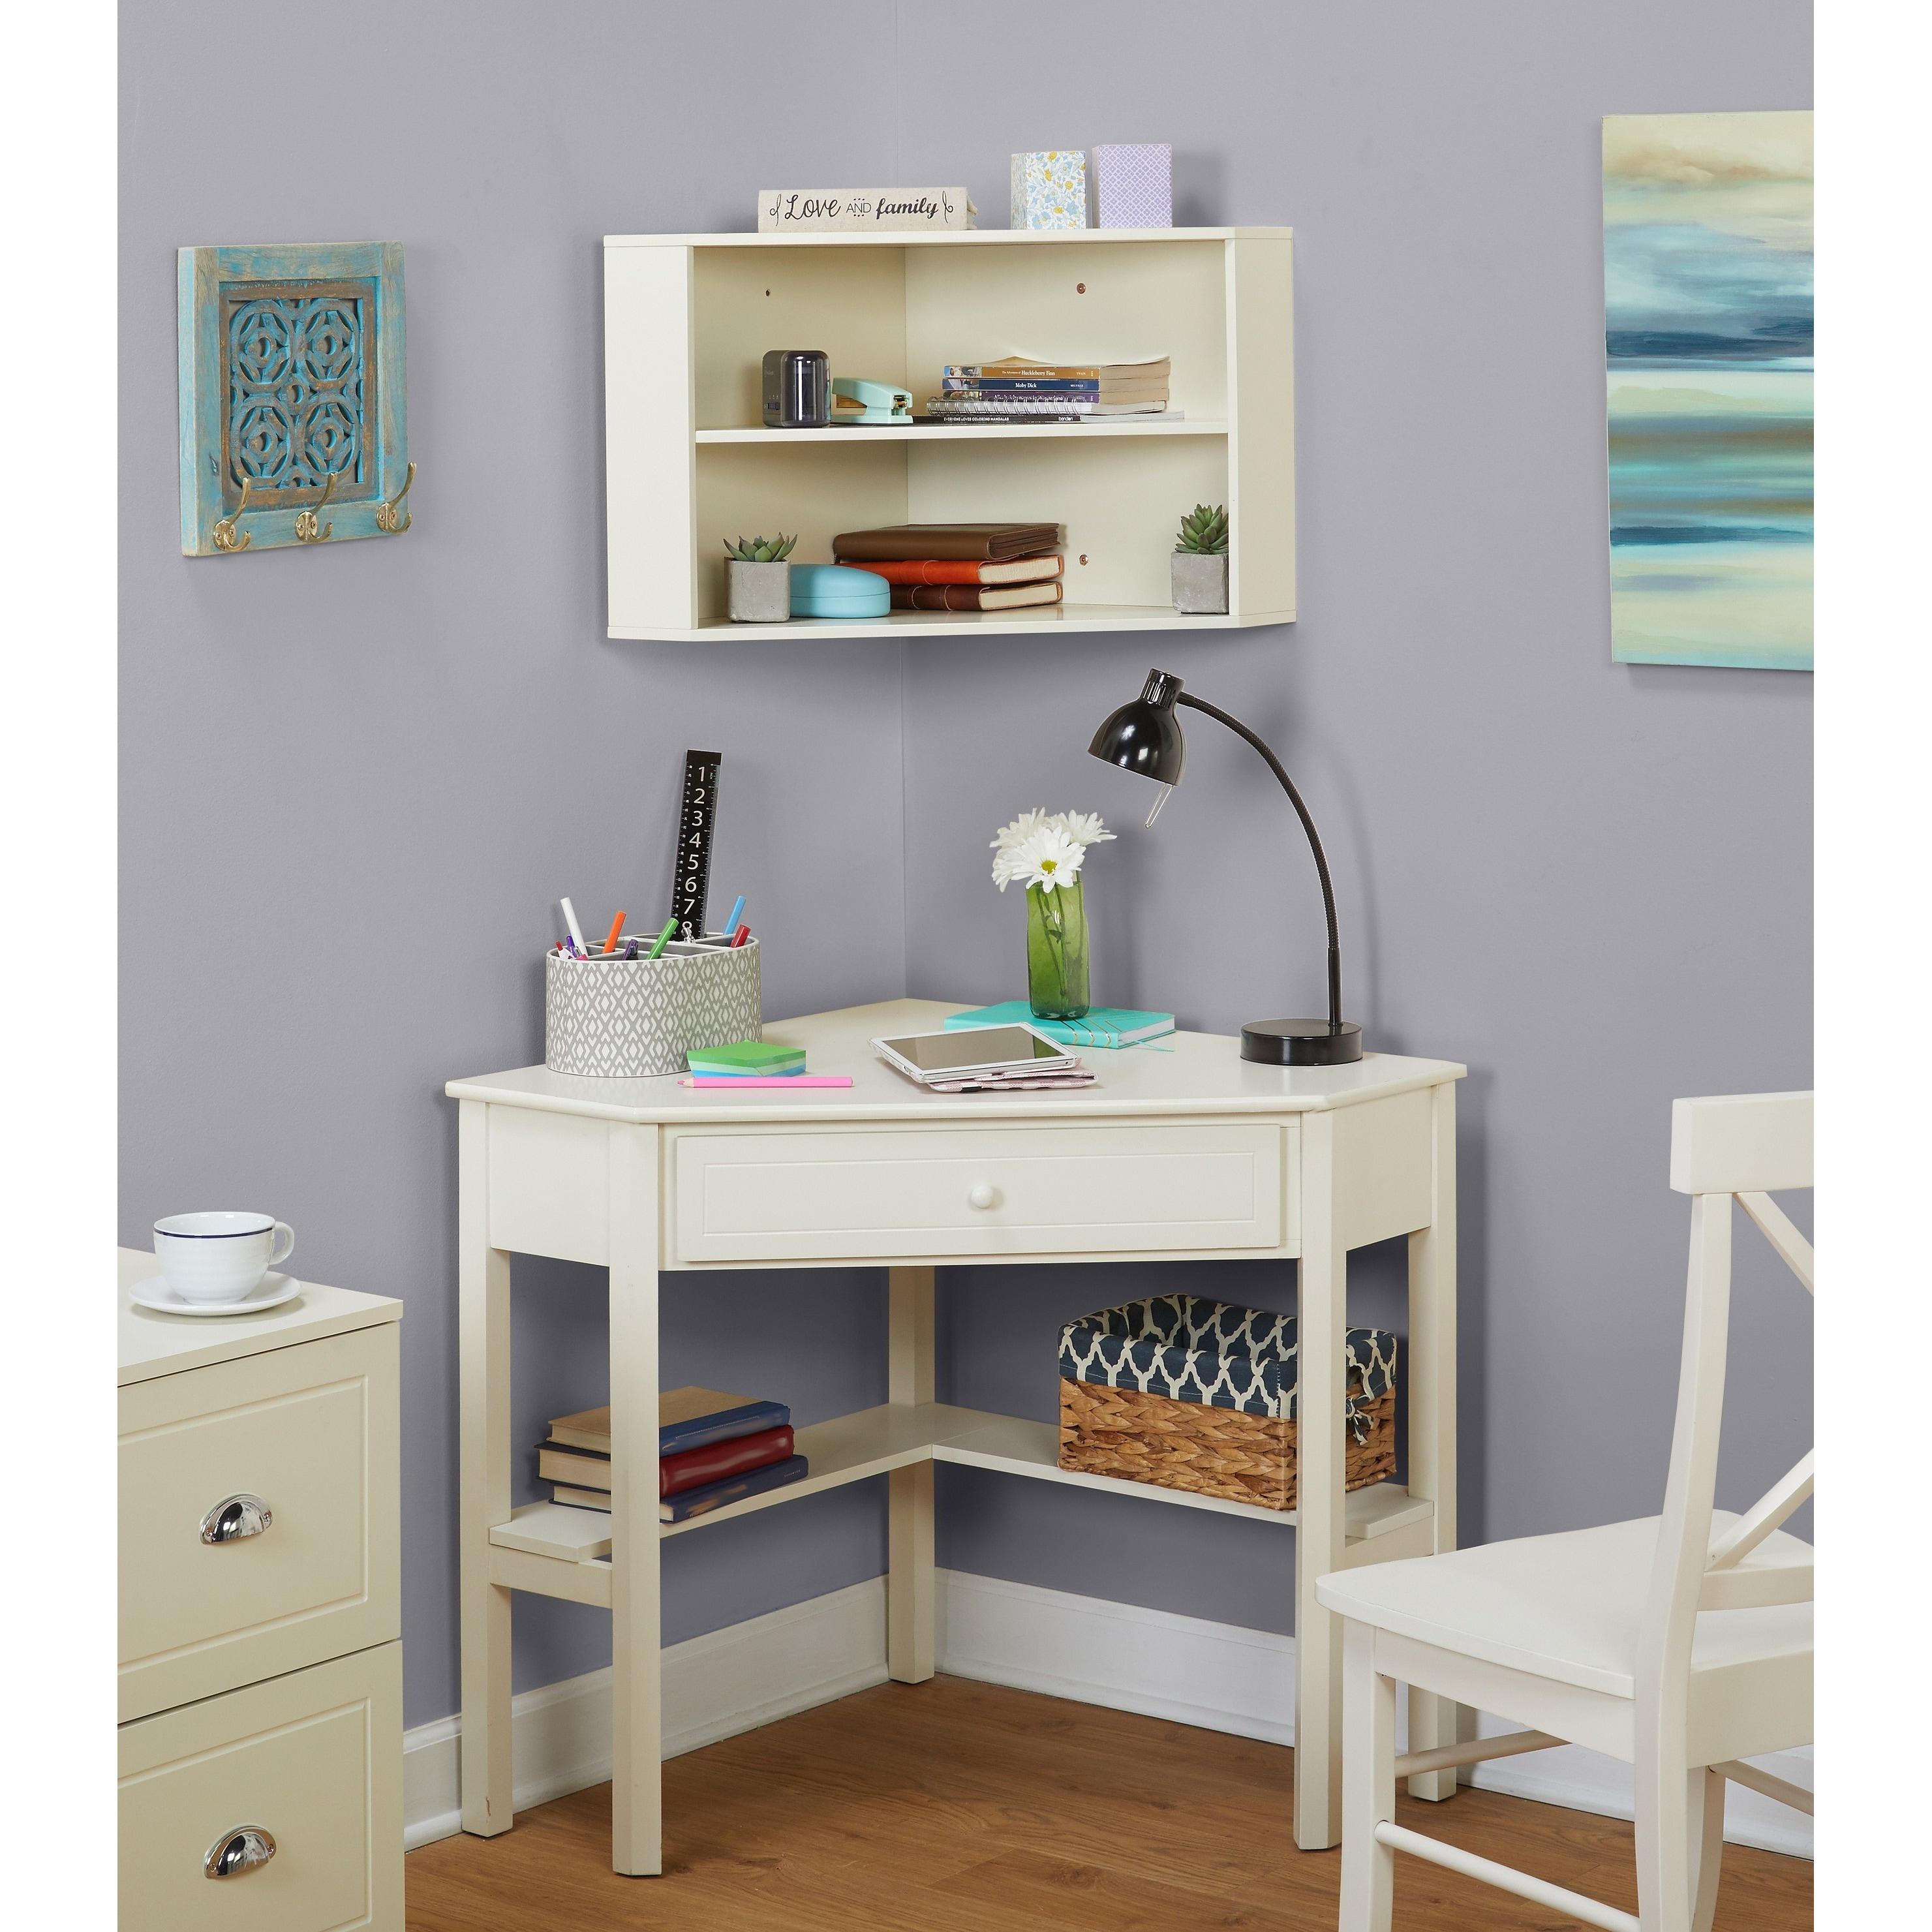 trim height aspenhome desk width cottonwooddesk pedestal shaped l curved item corner products cottonwood hutch threshold half and